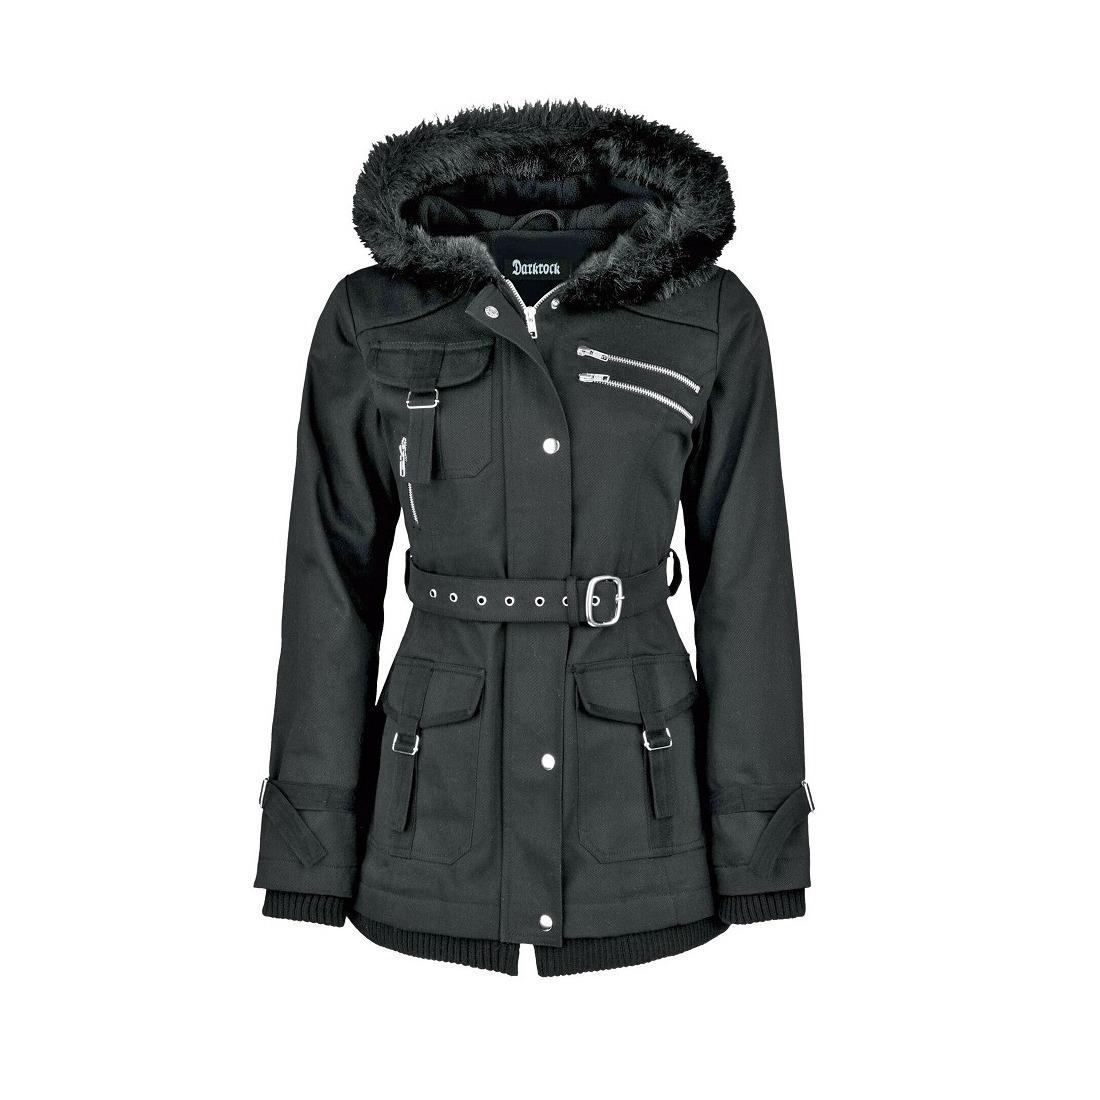 Handmade Women's coat Jacket Winter Jacket With Multi Pocket Jacket (4)